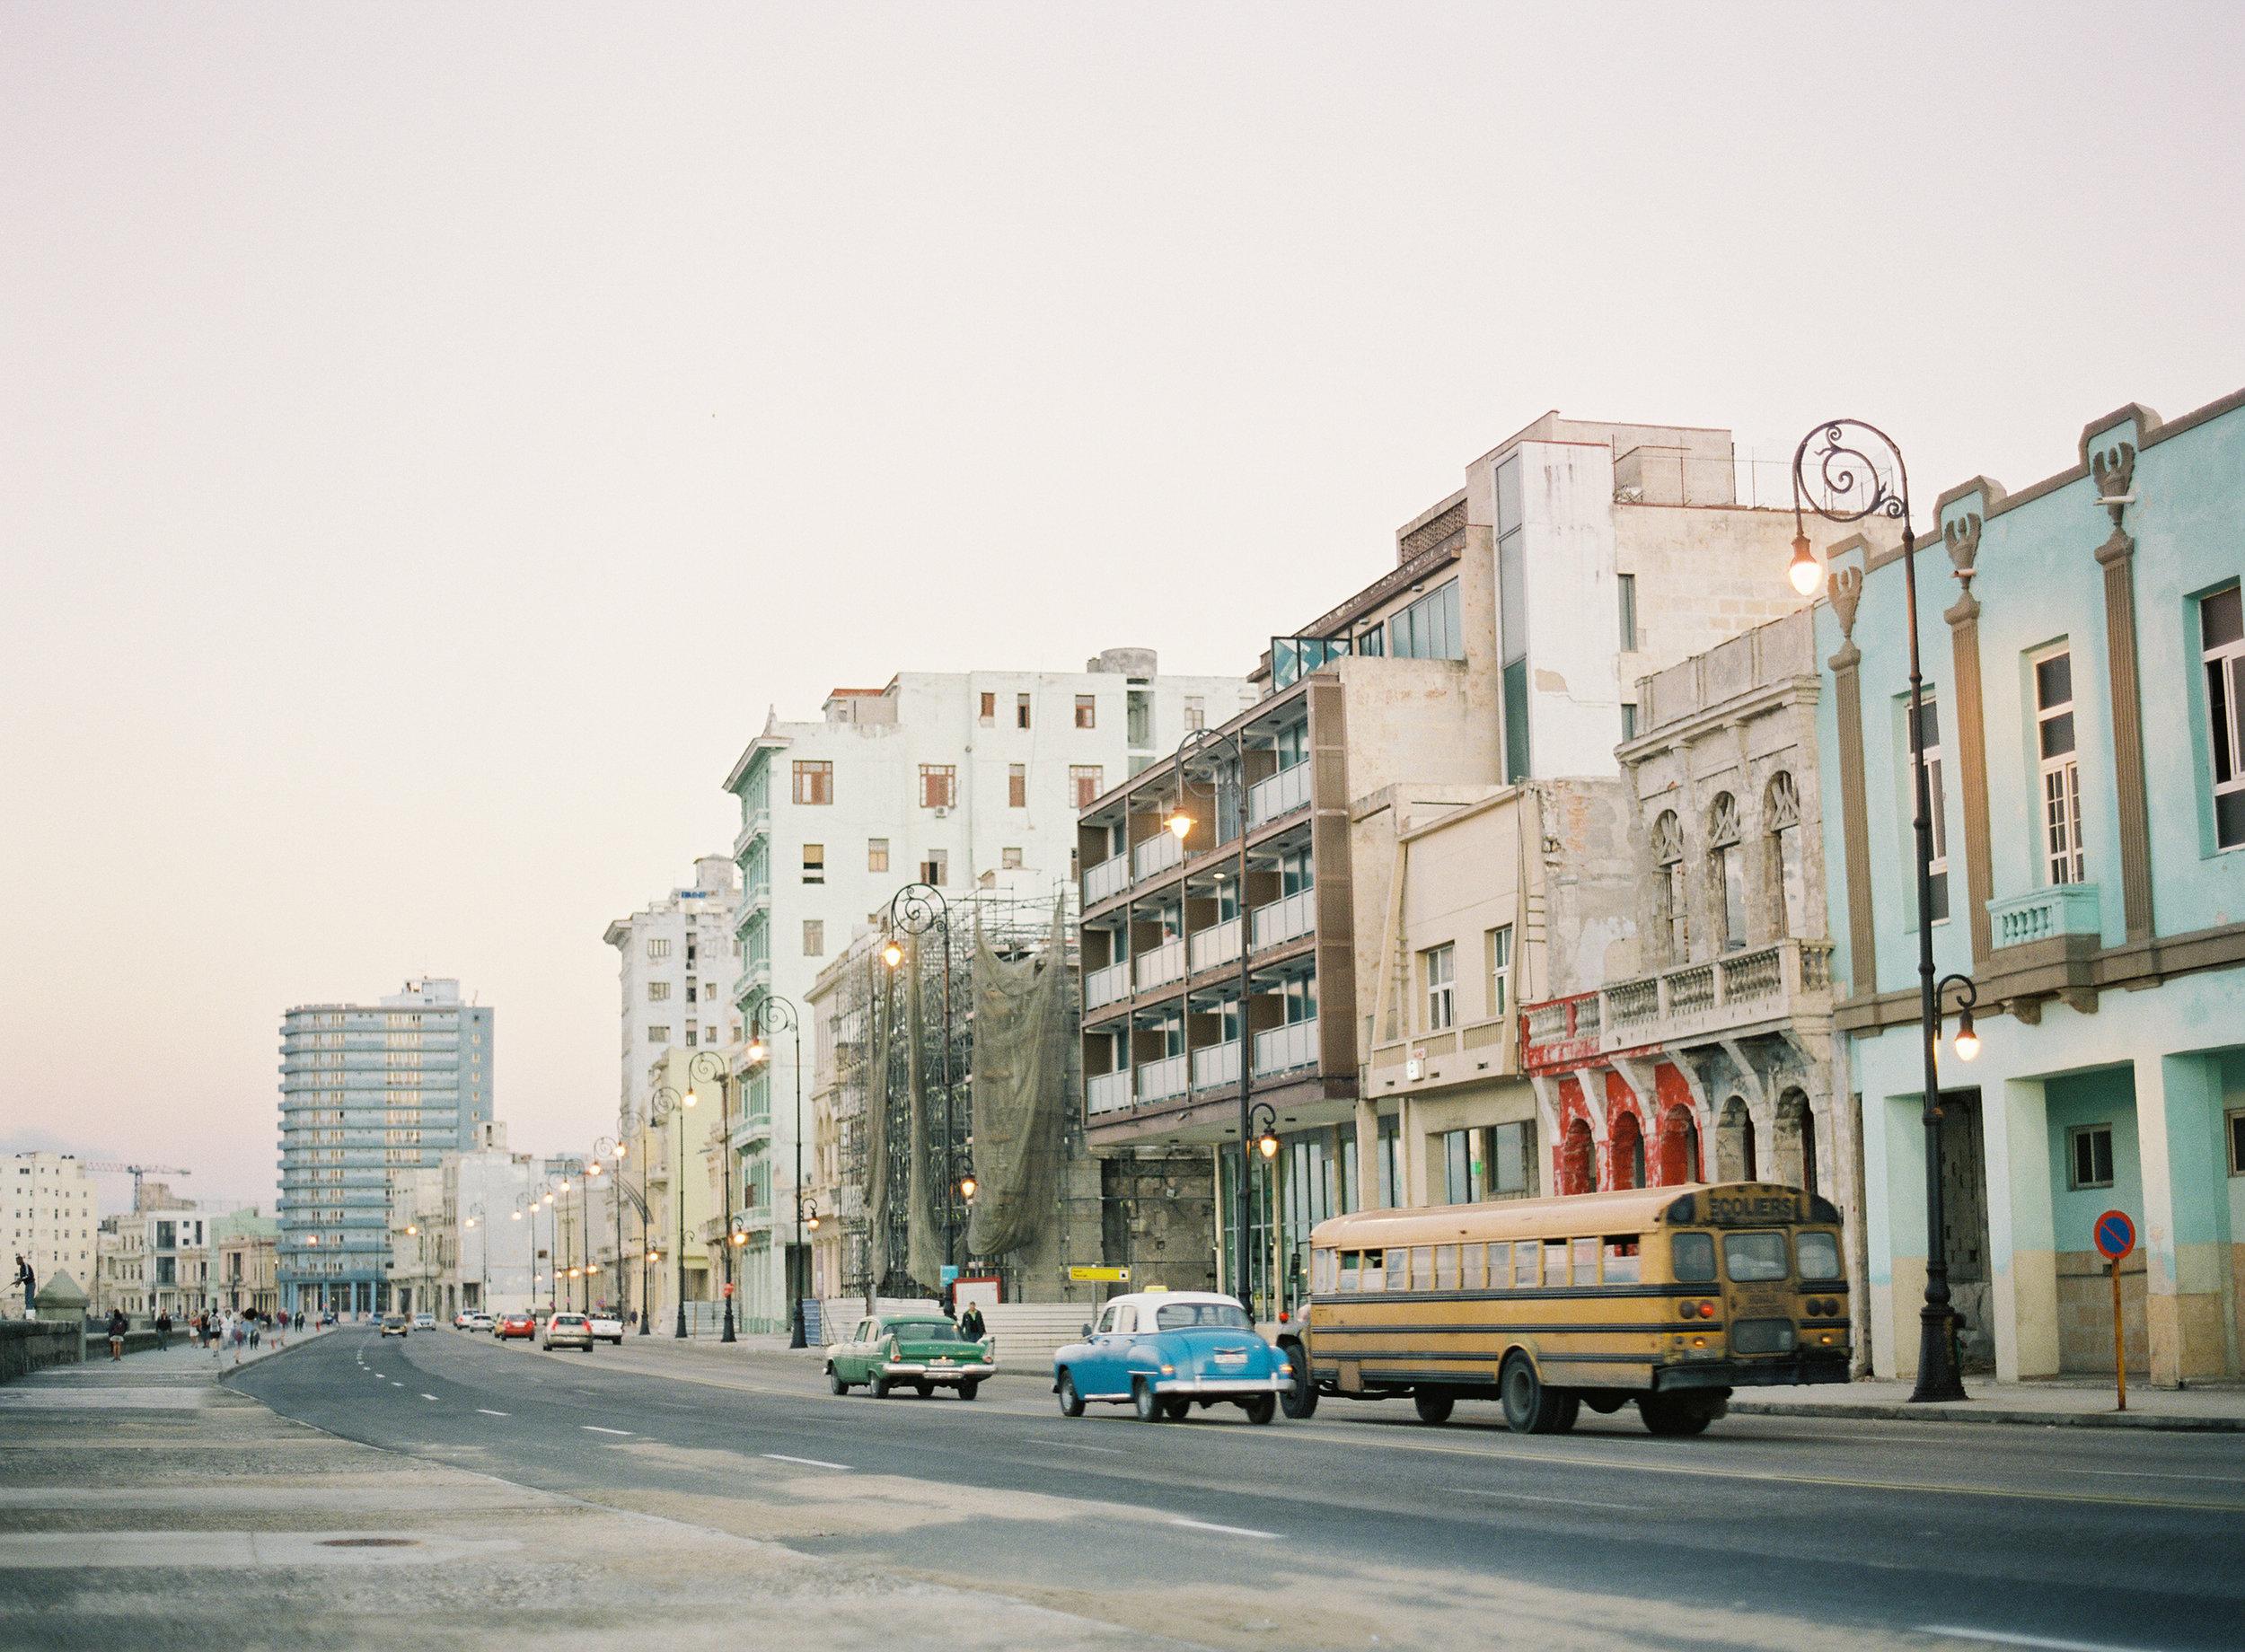 Cuba - Havana & Vinales